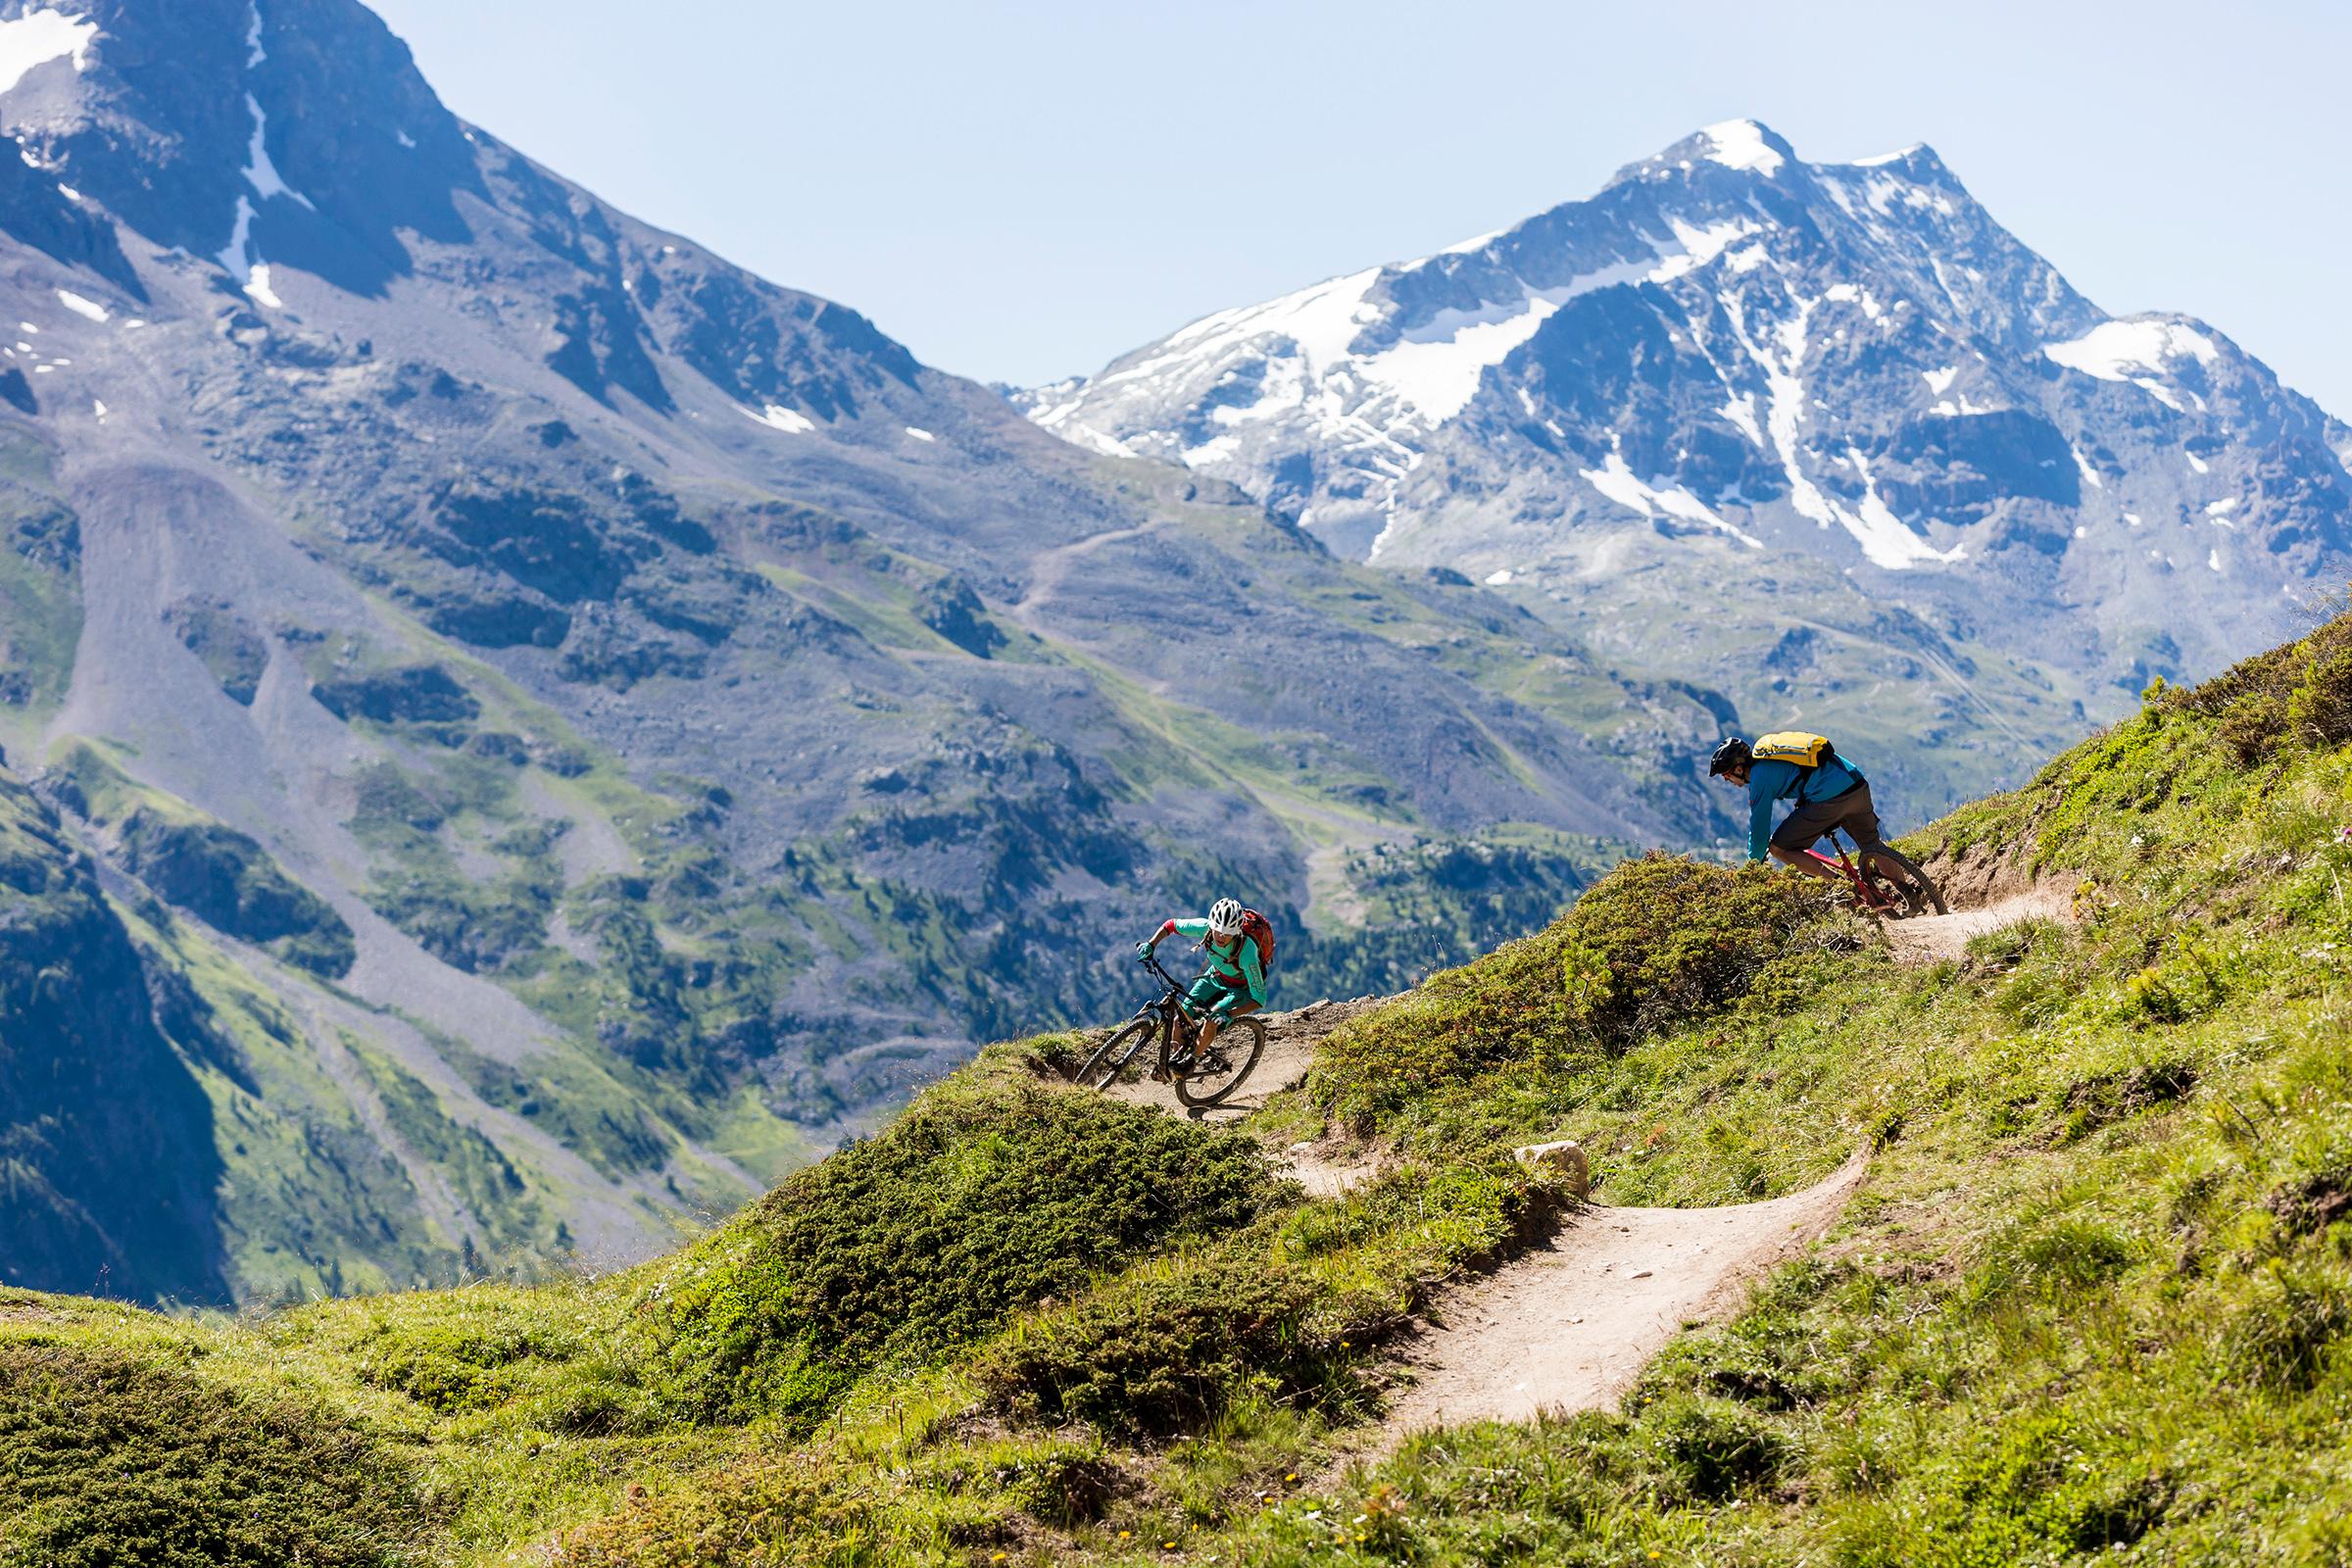 Mountain-biker's code of conduct